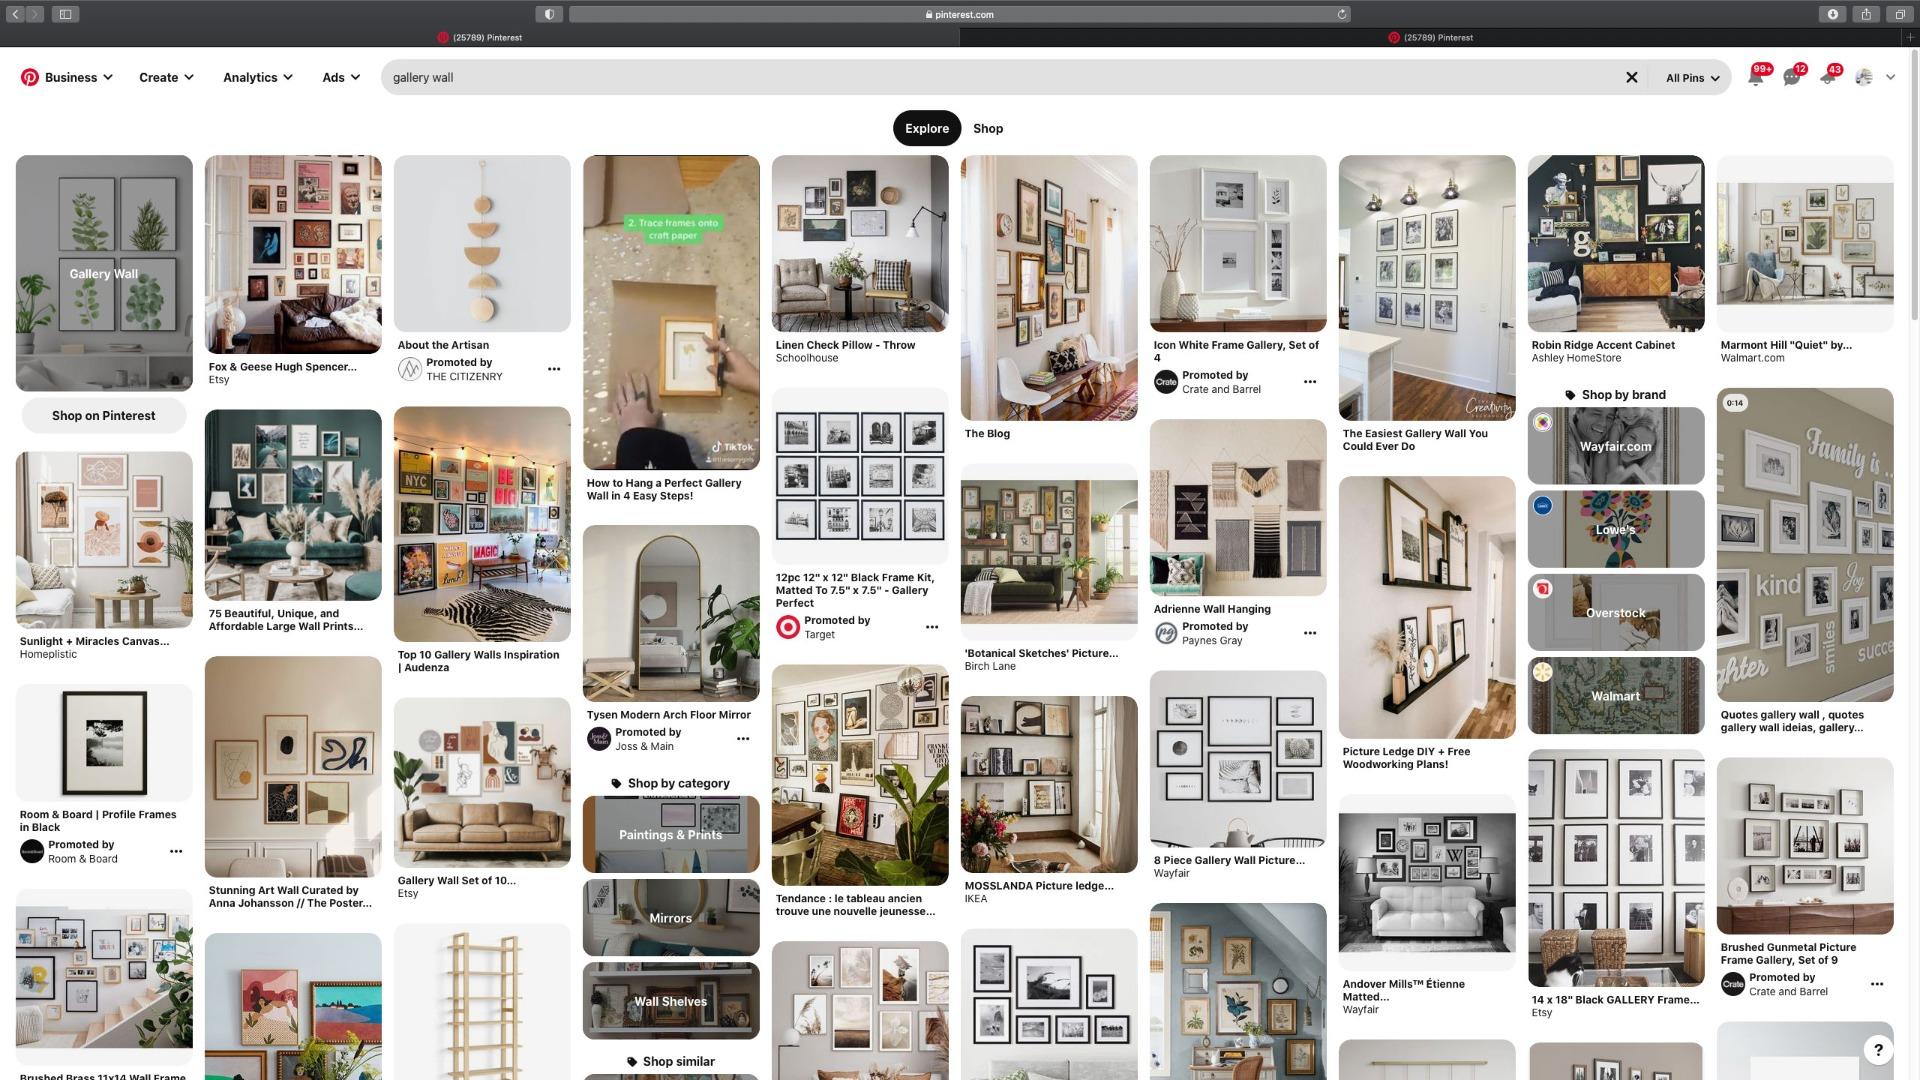 Gallery Wall Pinterest Inspiration